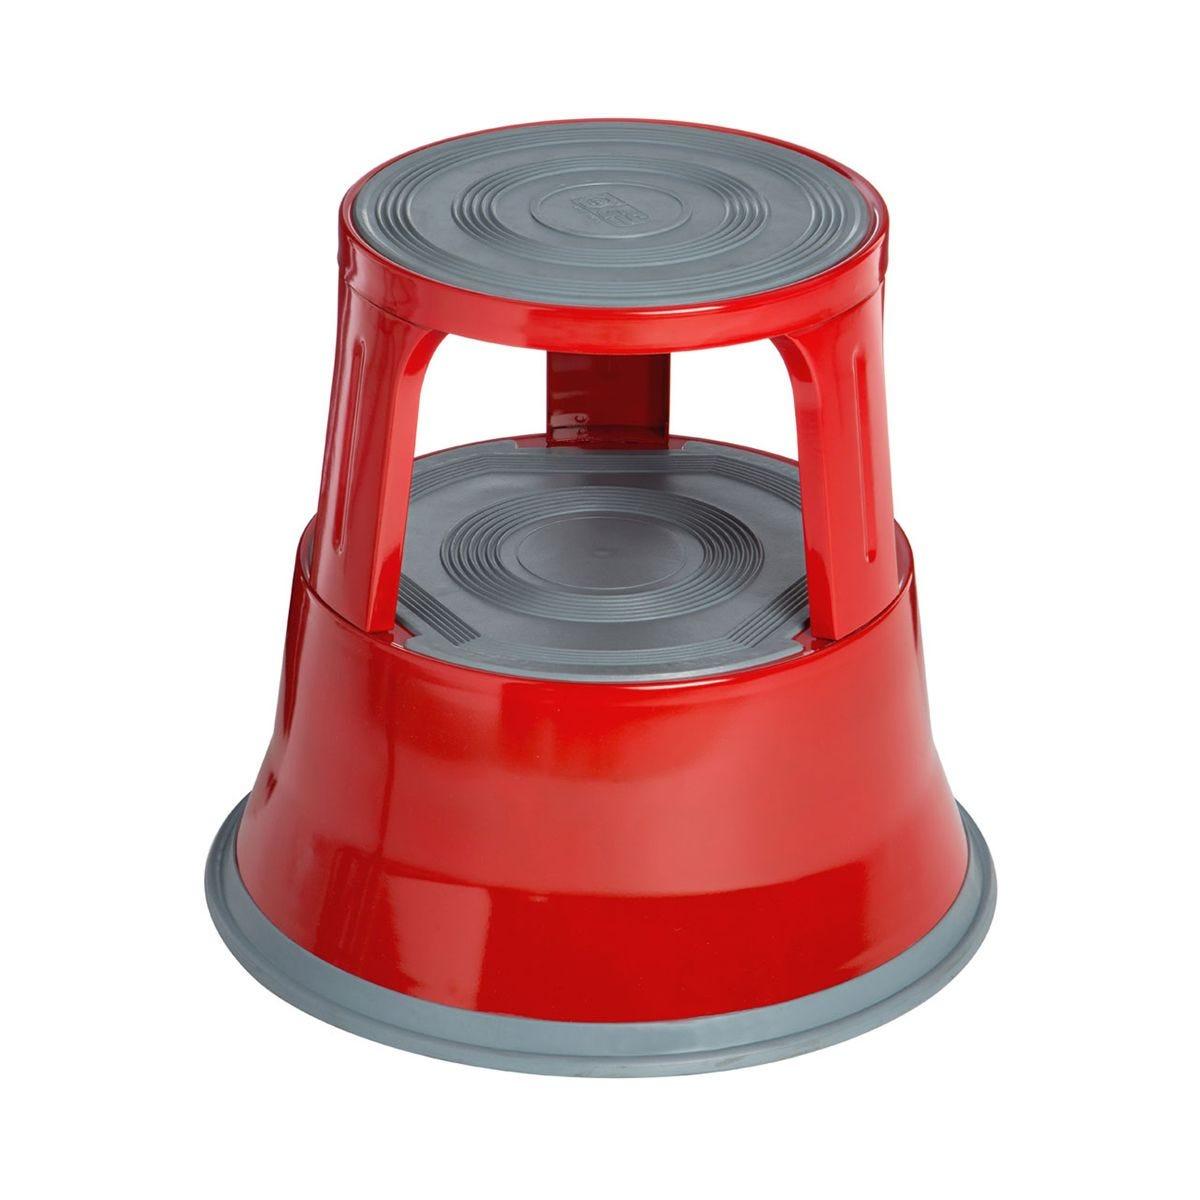 Premier Housewares 2 Tier Red Step Stool